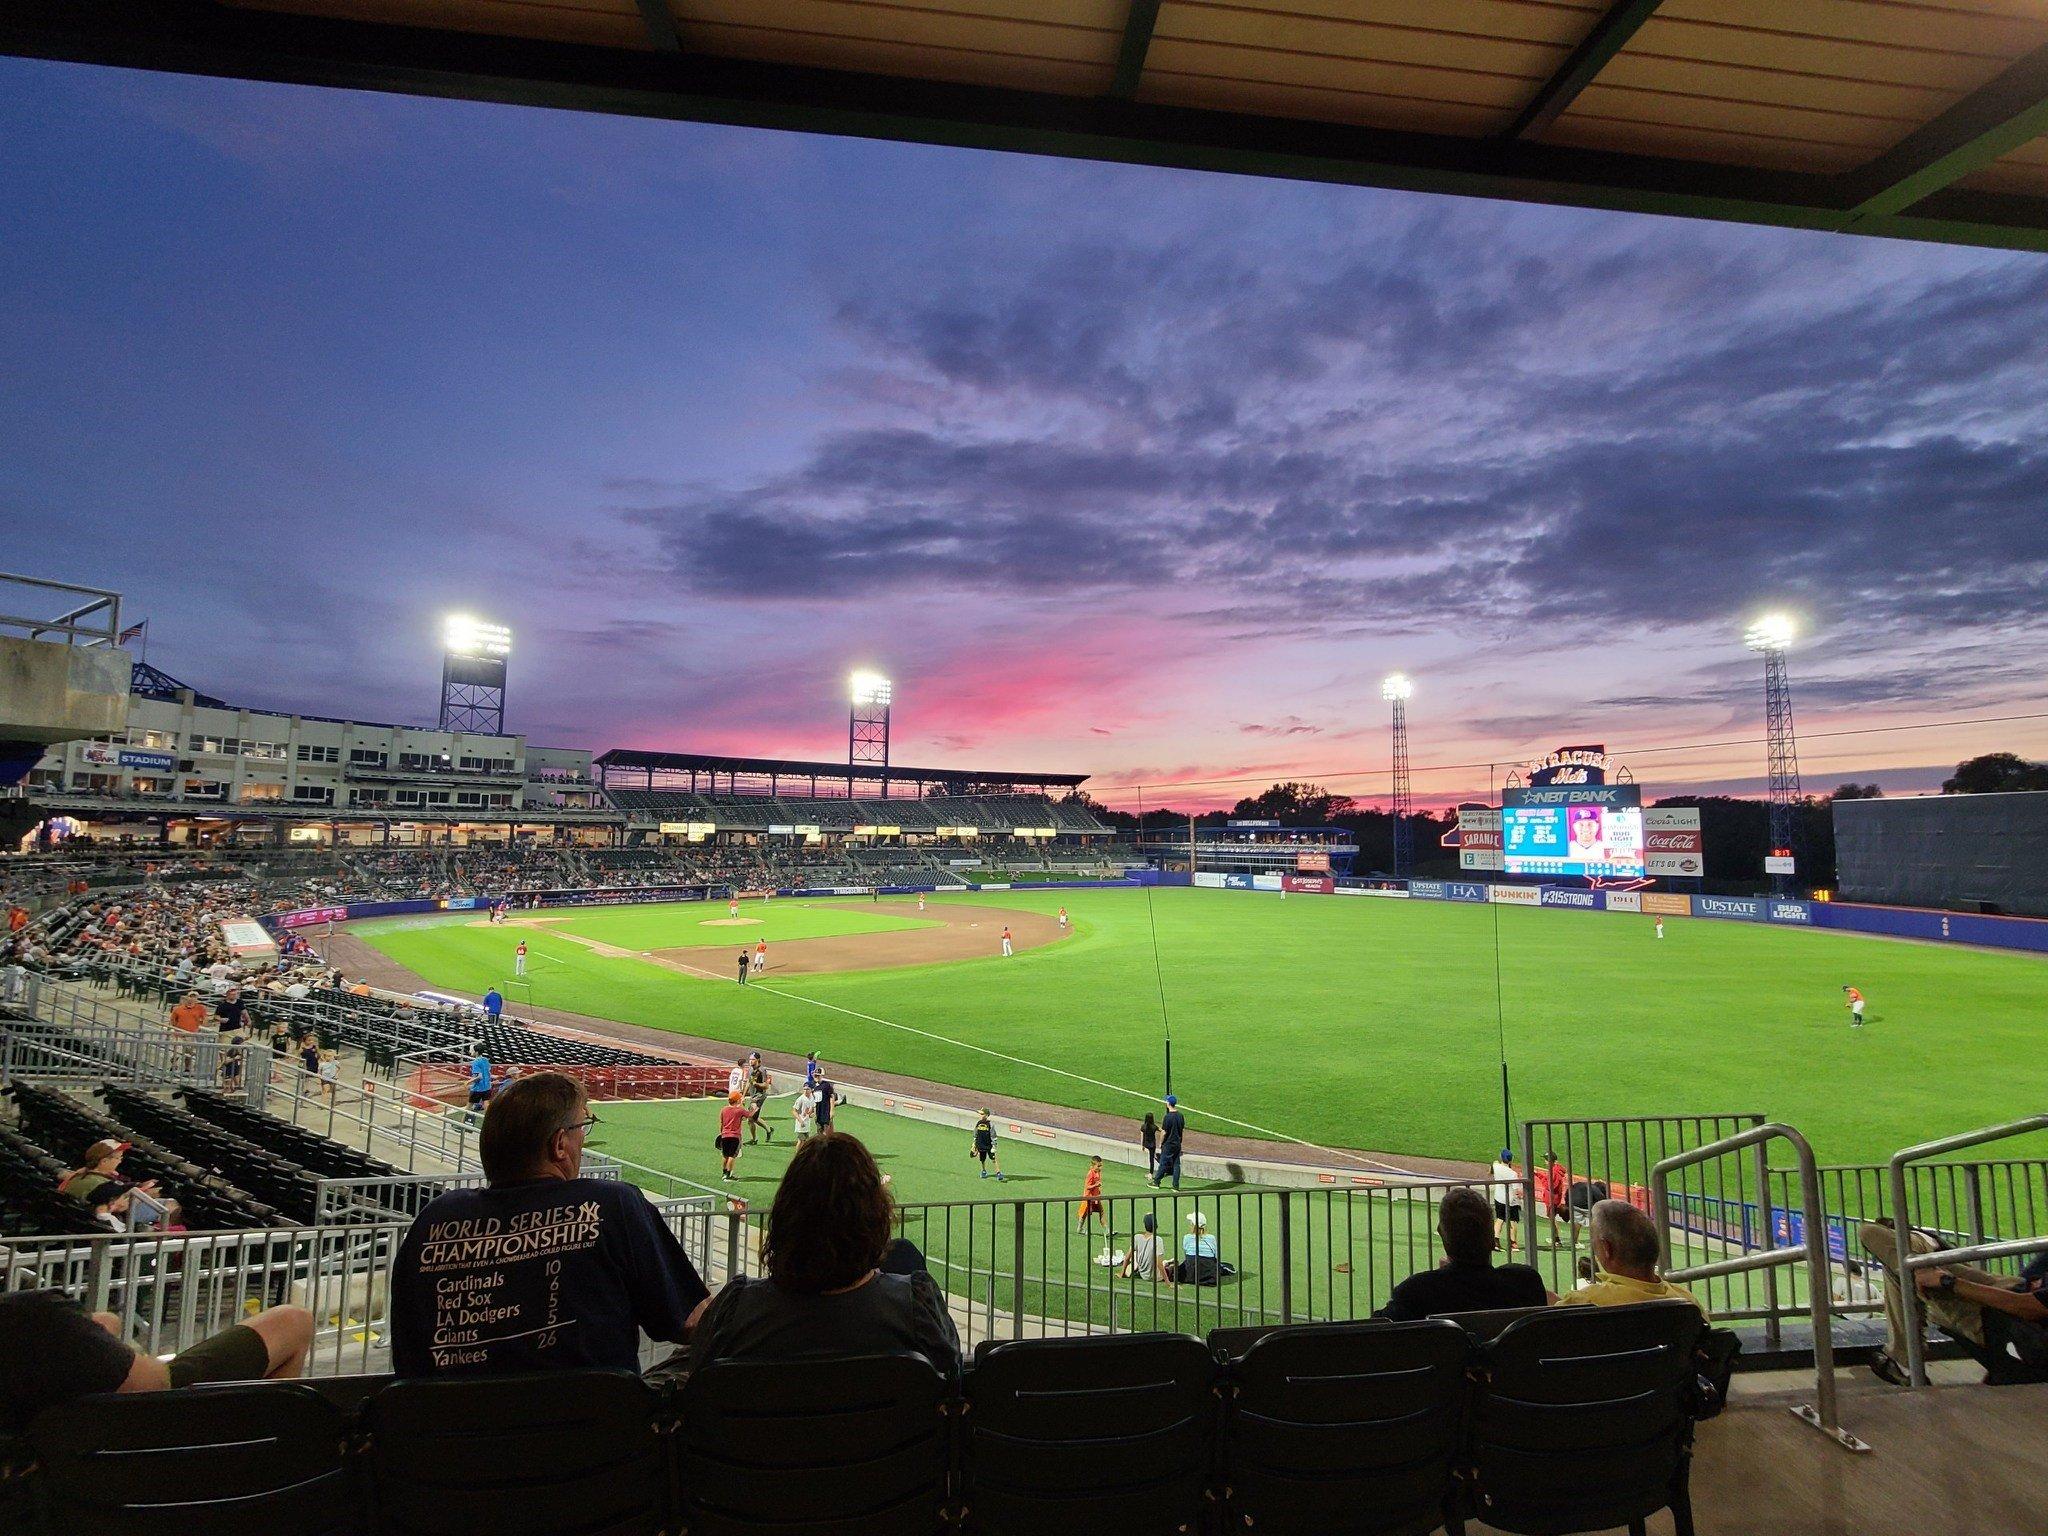 Sunset at the stadium